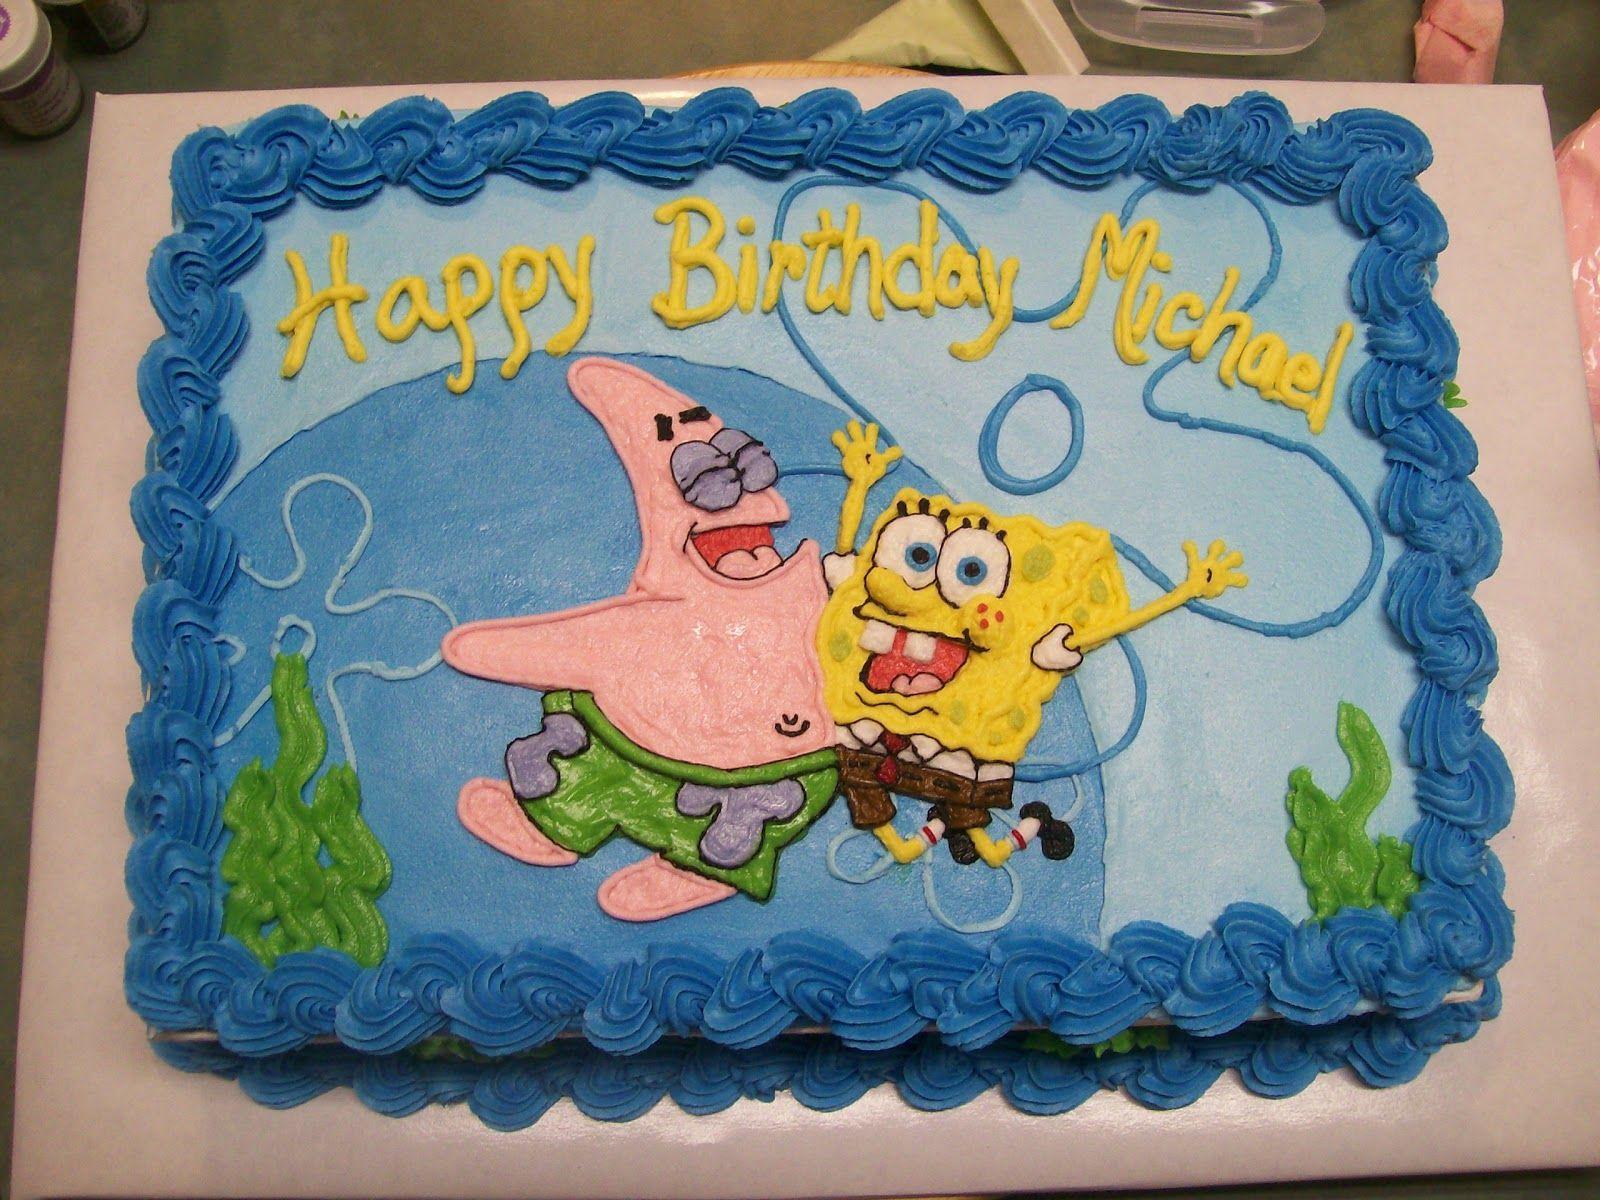 Spongebob Squarepants Buttercream Cake Spongebob And